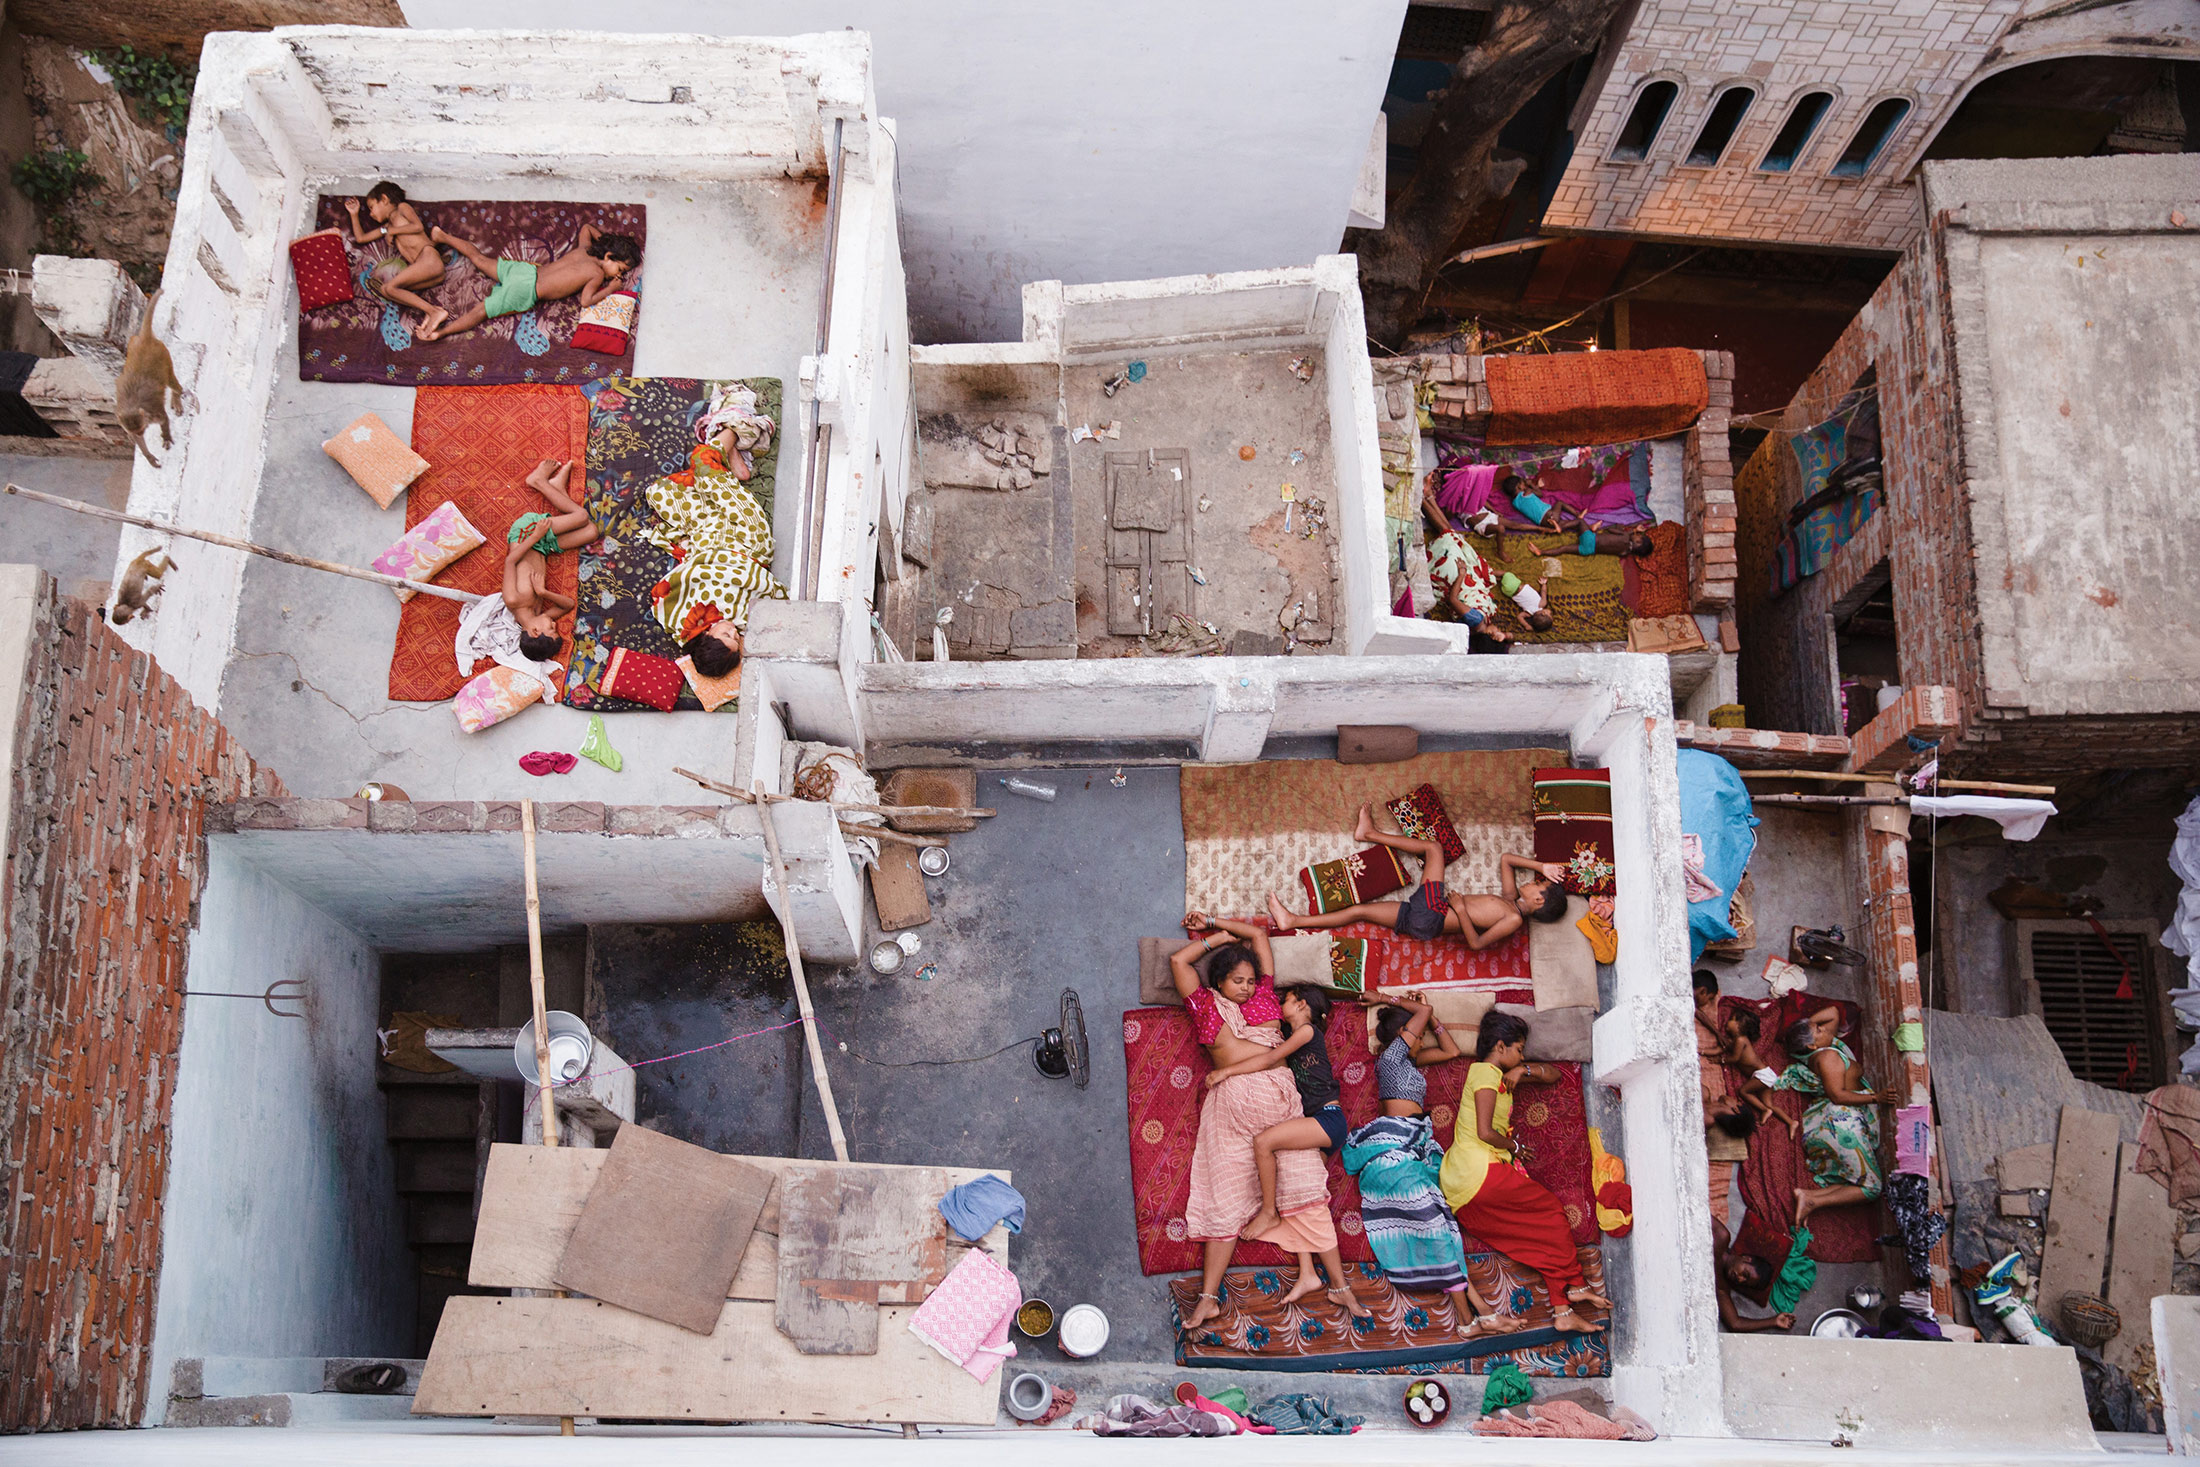 People Second Place: Rooftop Dreams, Varanasi